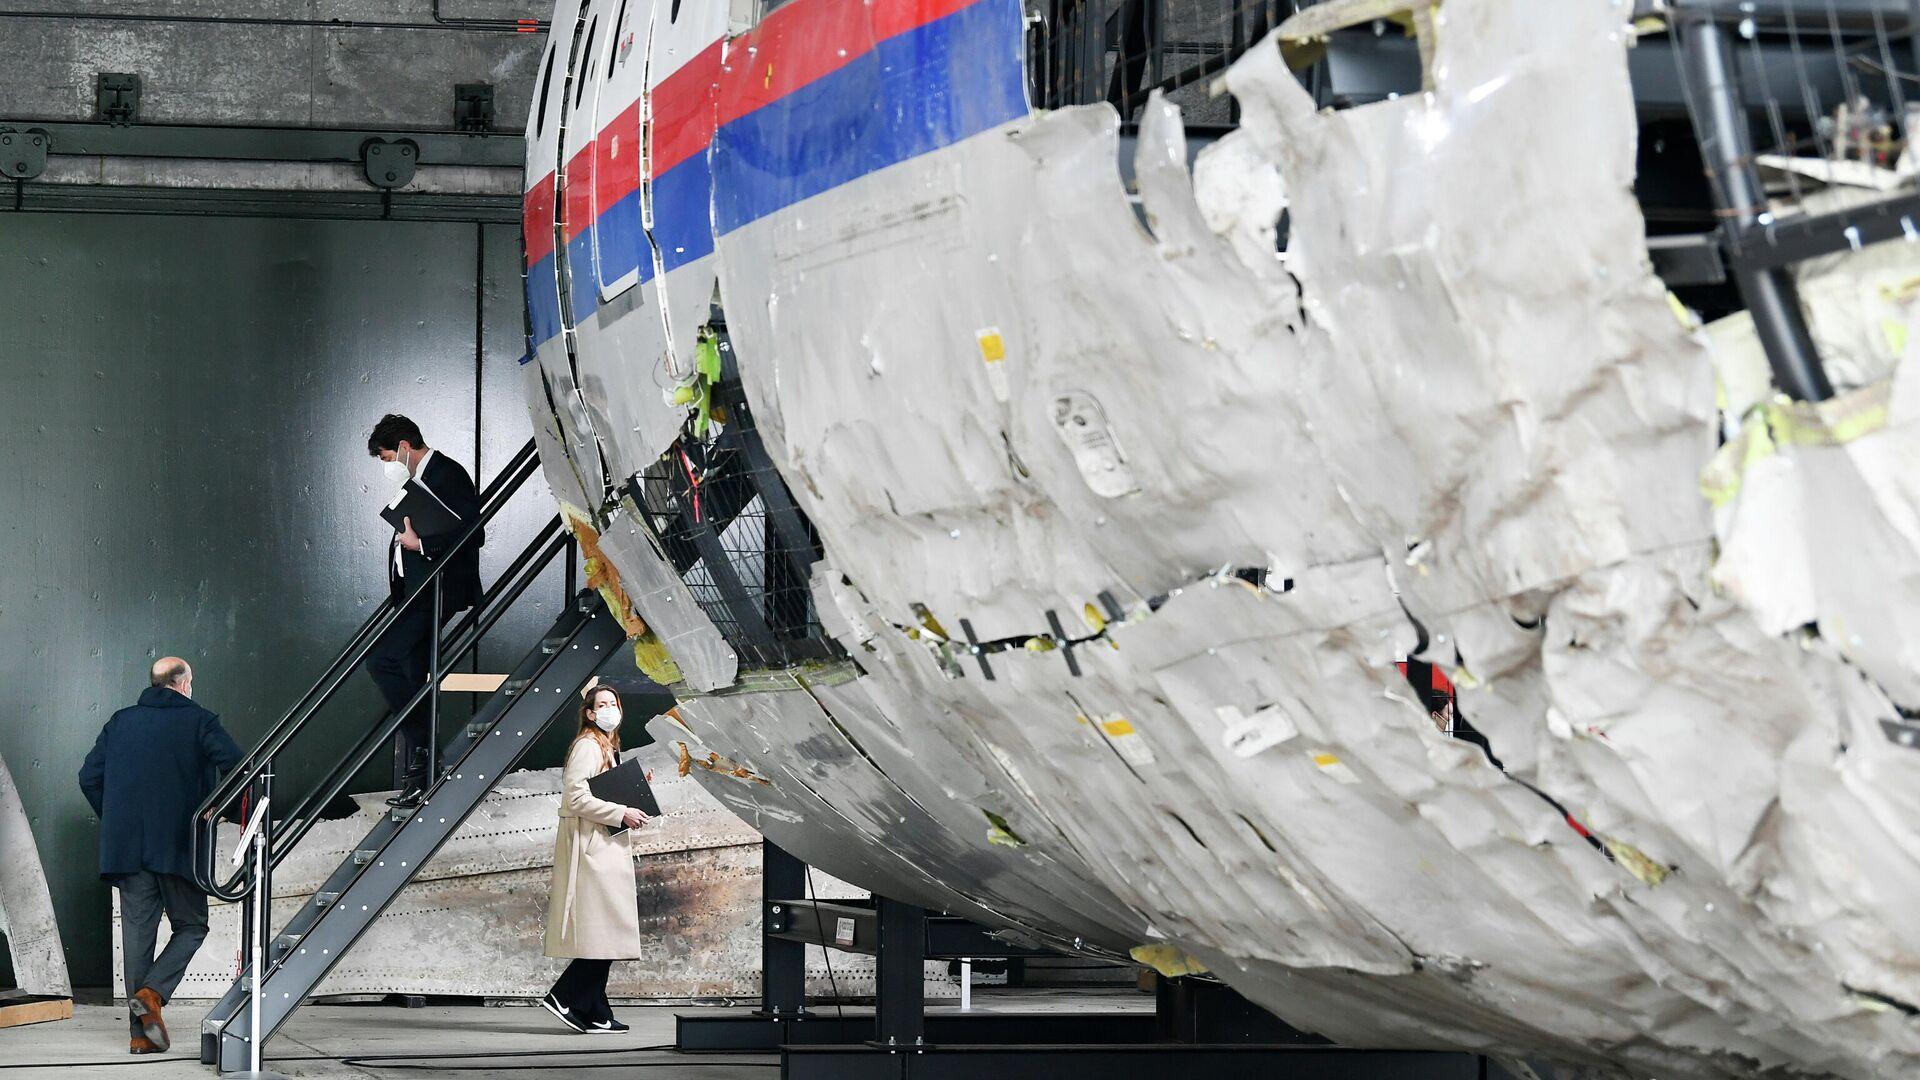 Судьи осматривают обломки рейса MH17 авиакомпании Malaysia Airlines на авиабазе Гильзе-Рейен, Нидерланды - РИА Новости, 1920, 24.06.2021